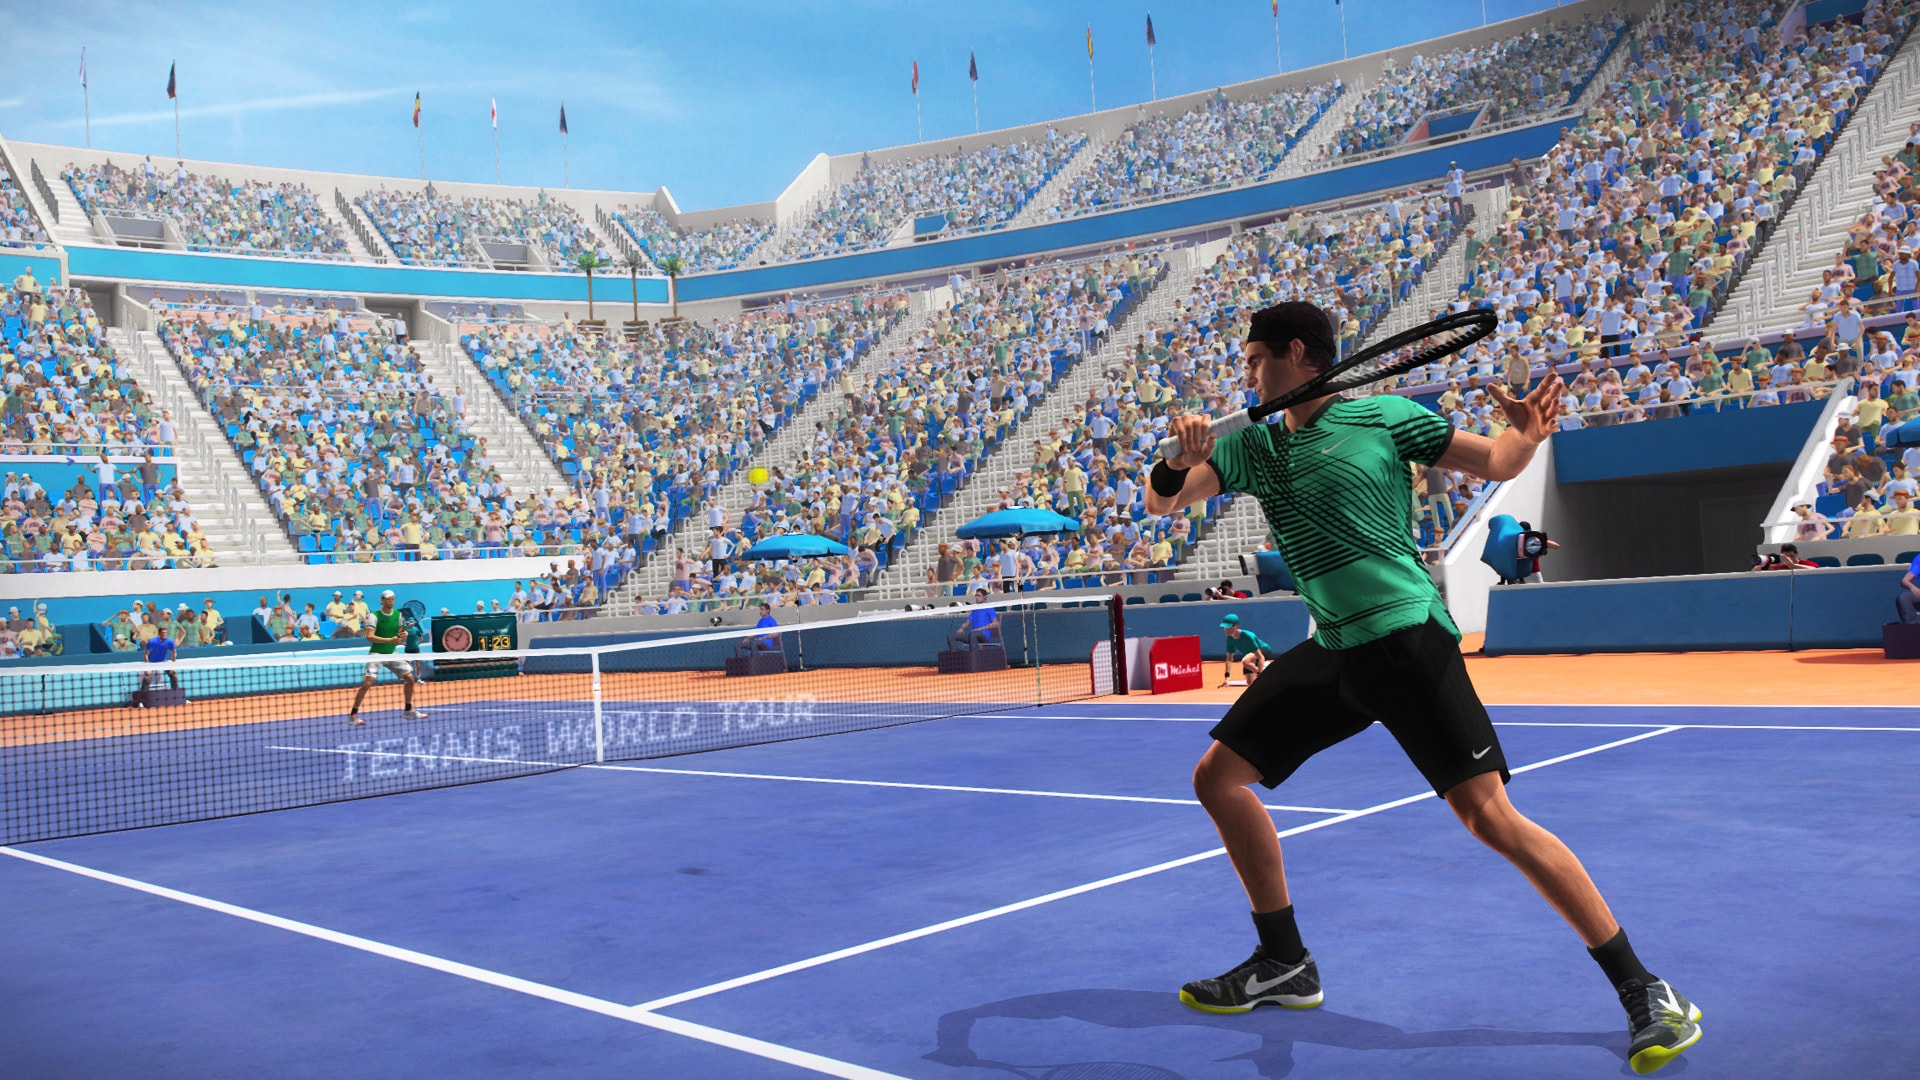 Primeras impresiones jugables de Tennis World Tour desde la Mutua Madrid Open